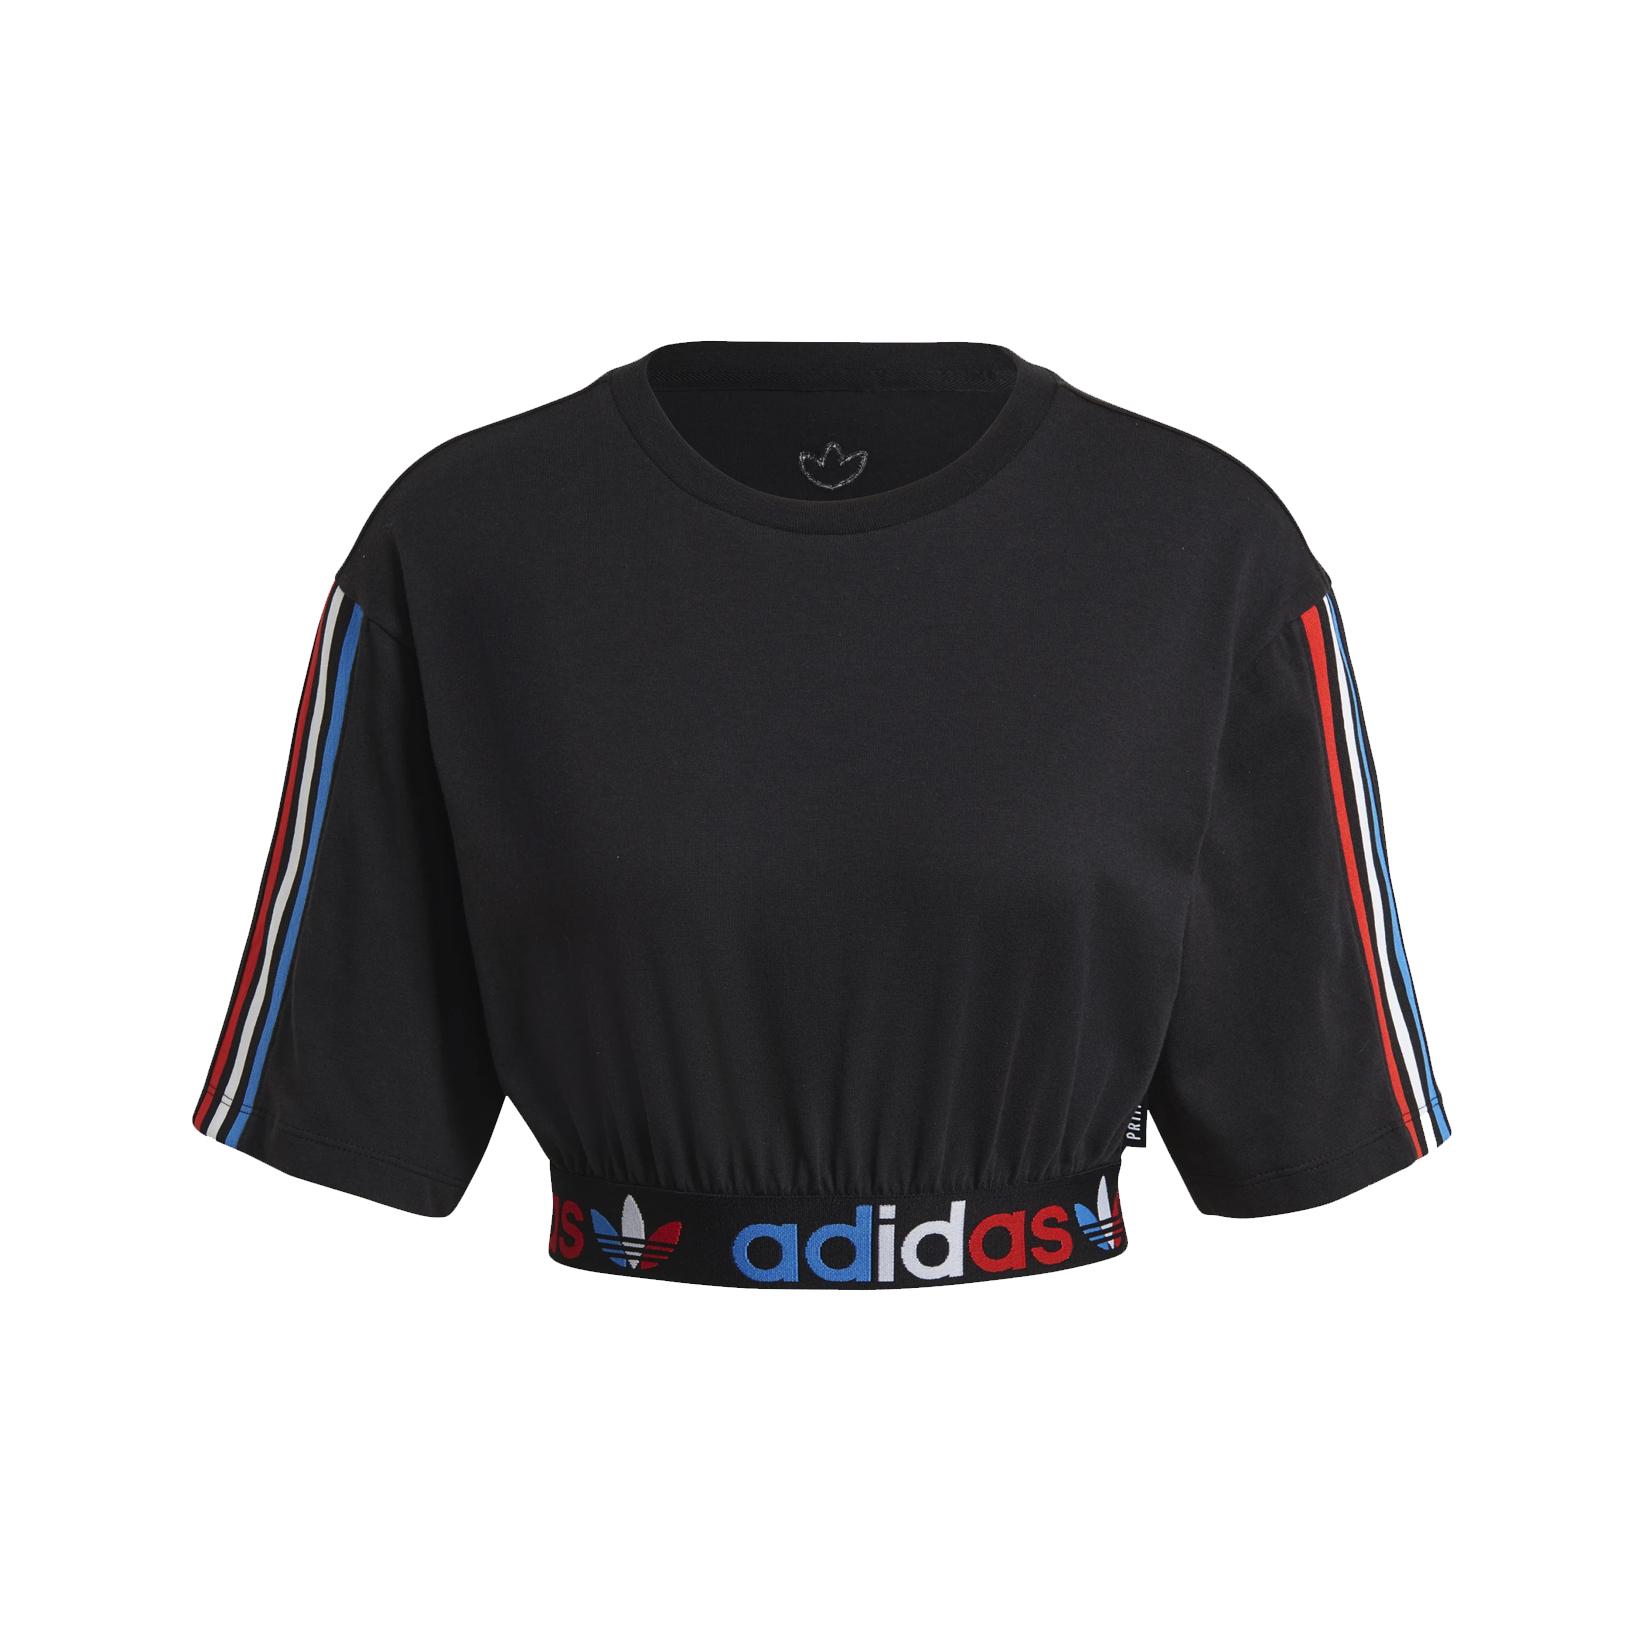 Adidas Originals Adicolor Primeblue Tricolor Cropped Tee Black